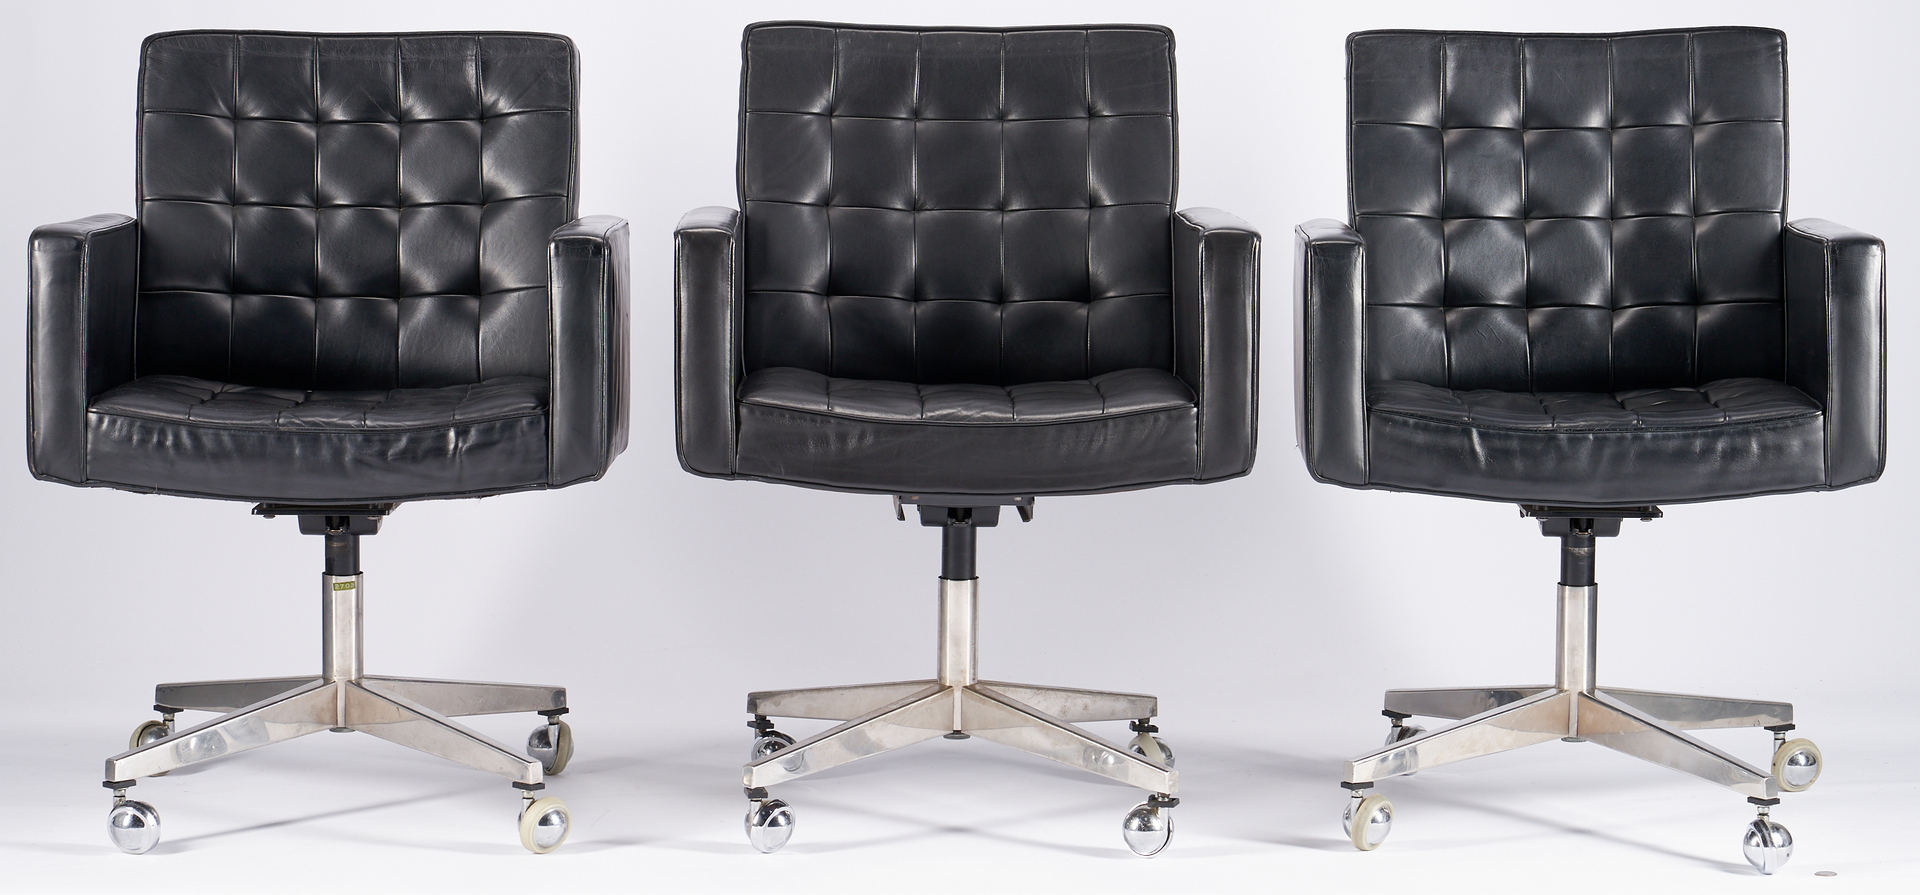 Lot 609: Set 12 Knoll Black Leather Swivel Chairs, Vincent Cafiero